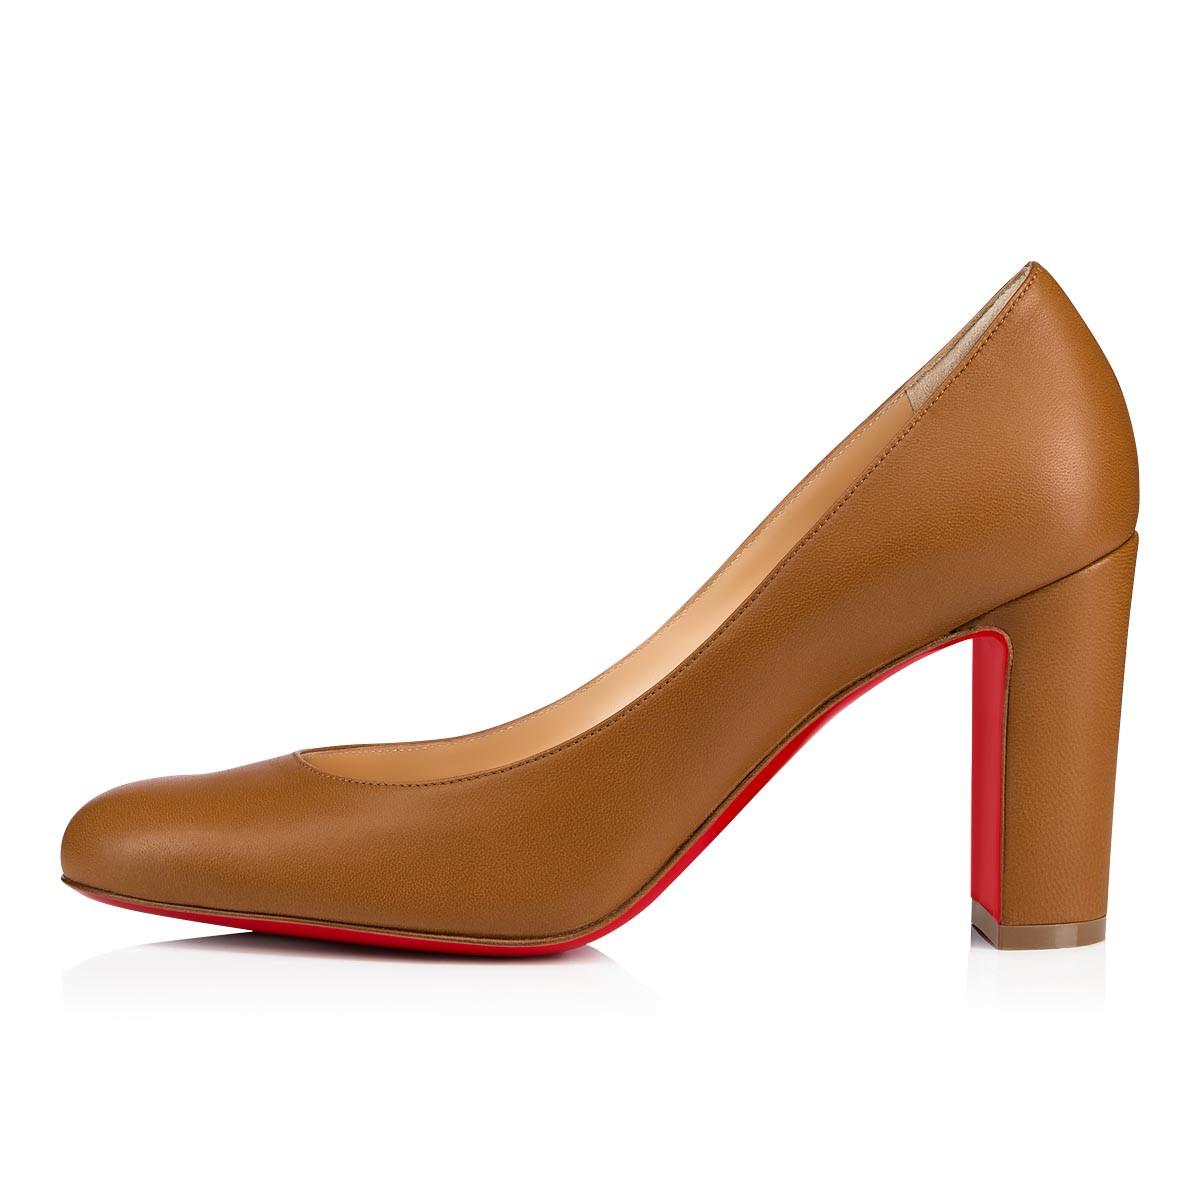 fea9806efd7 LADY GENA 85 Caramel Nappa leather - Women Shoes - Christian Louboutin